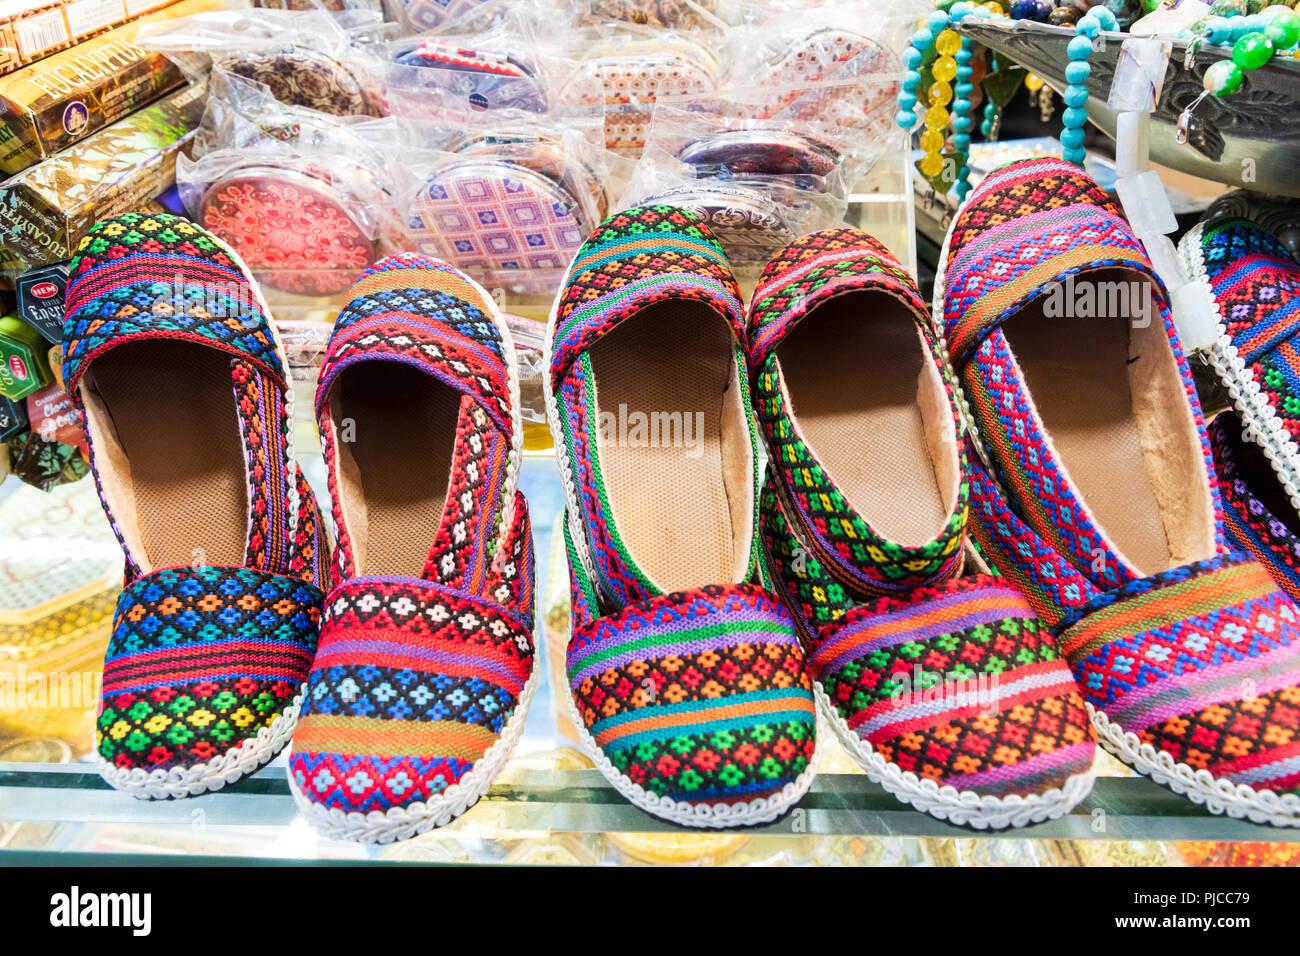 Islamic Republic of Iran. Shiraz. Slippers. Stock Photo